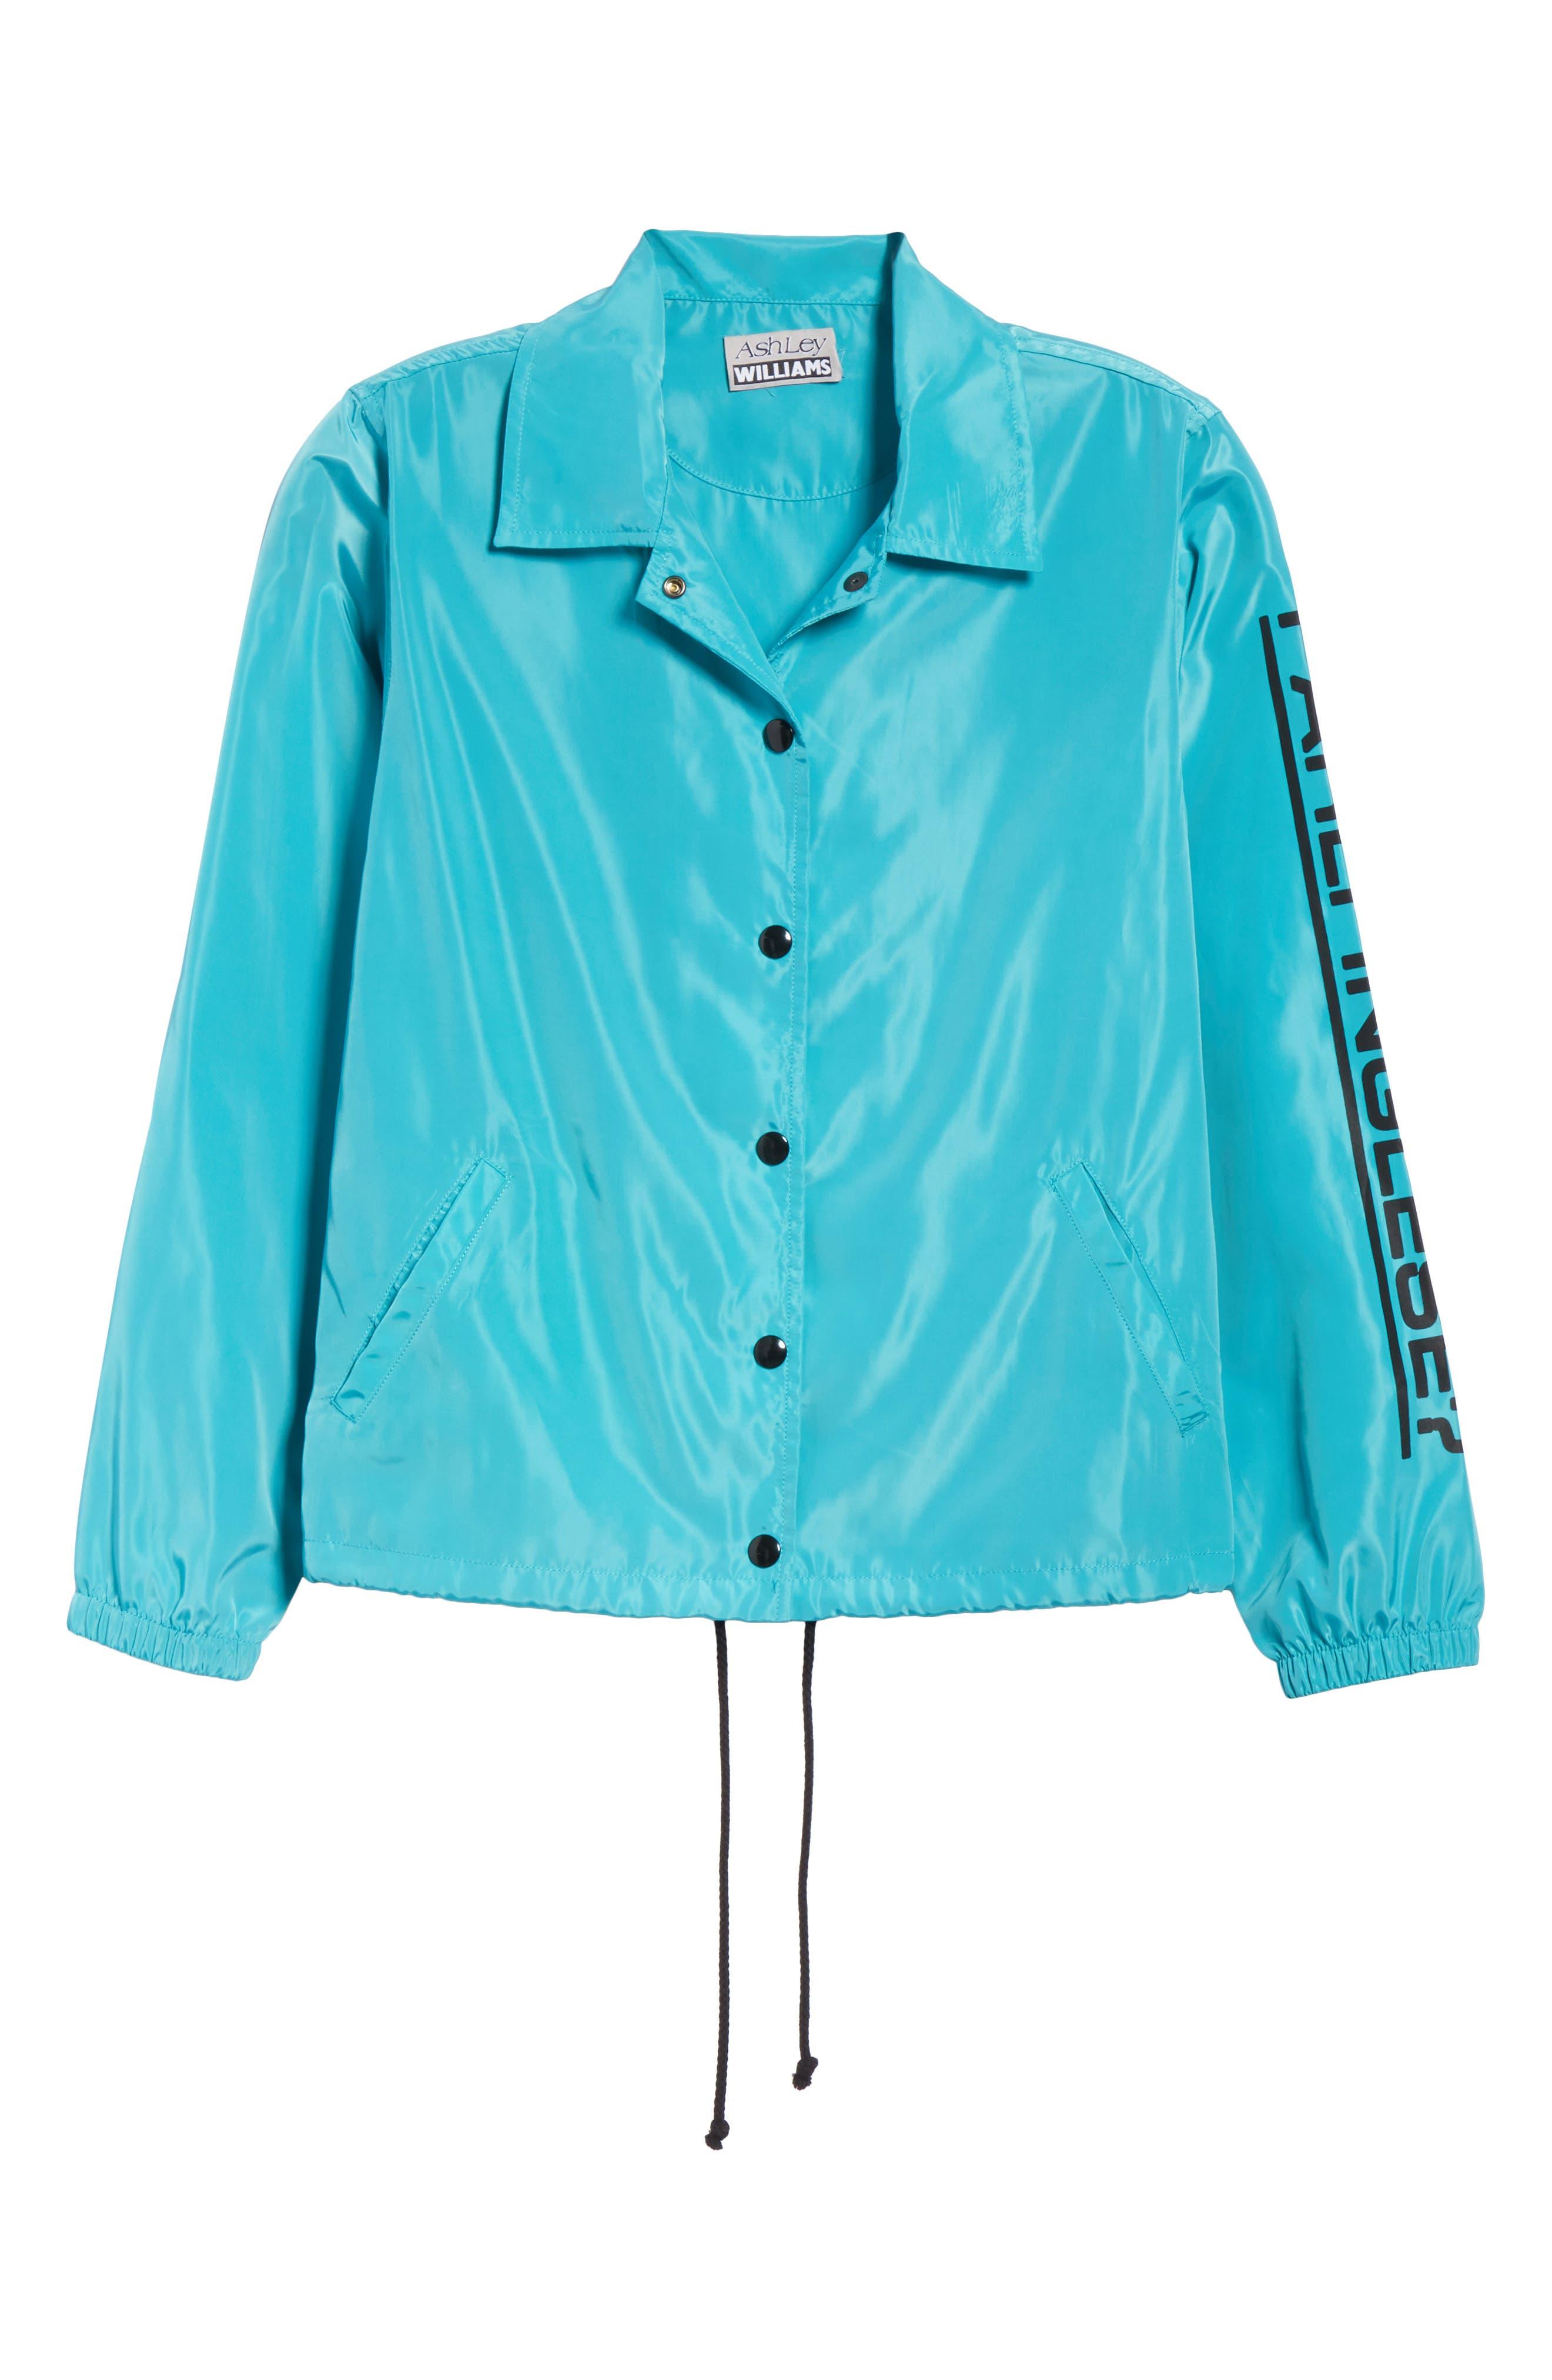 Parli Inglese Coach Jacket,                             Alternate thumbnail 6, color,                             Turquoise